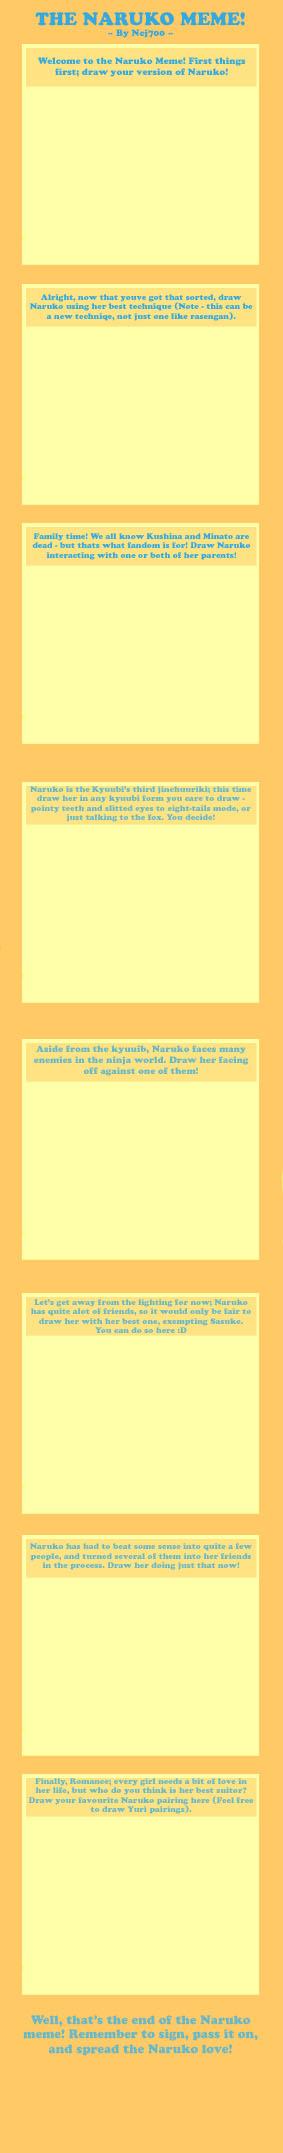 The Naruko Meme by Ncj700